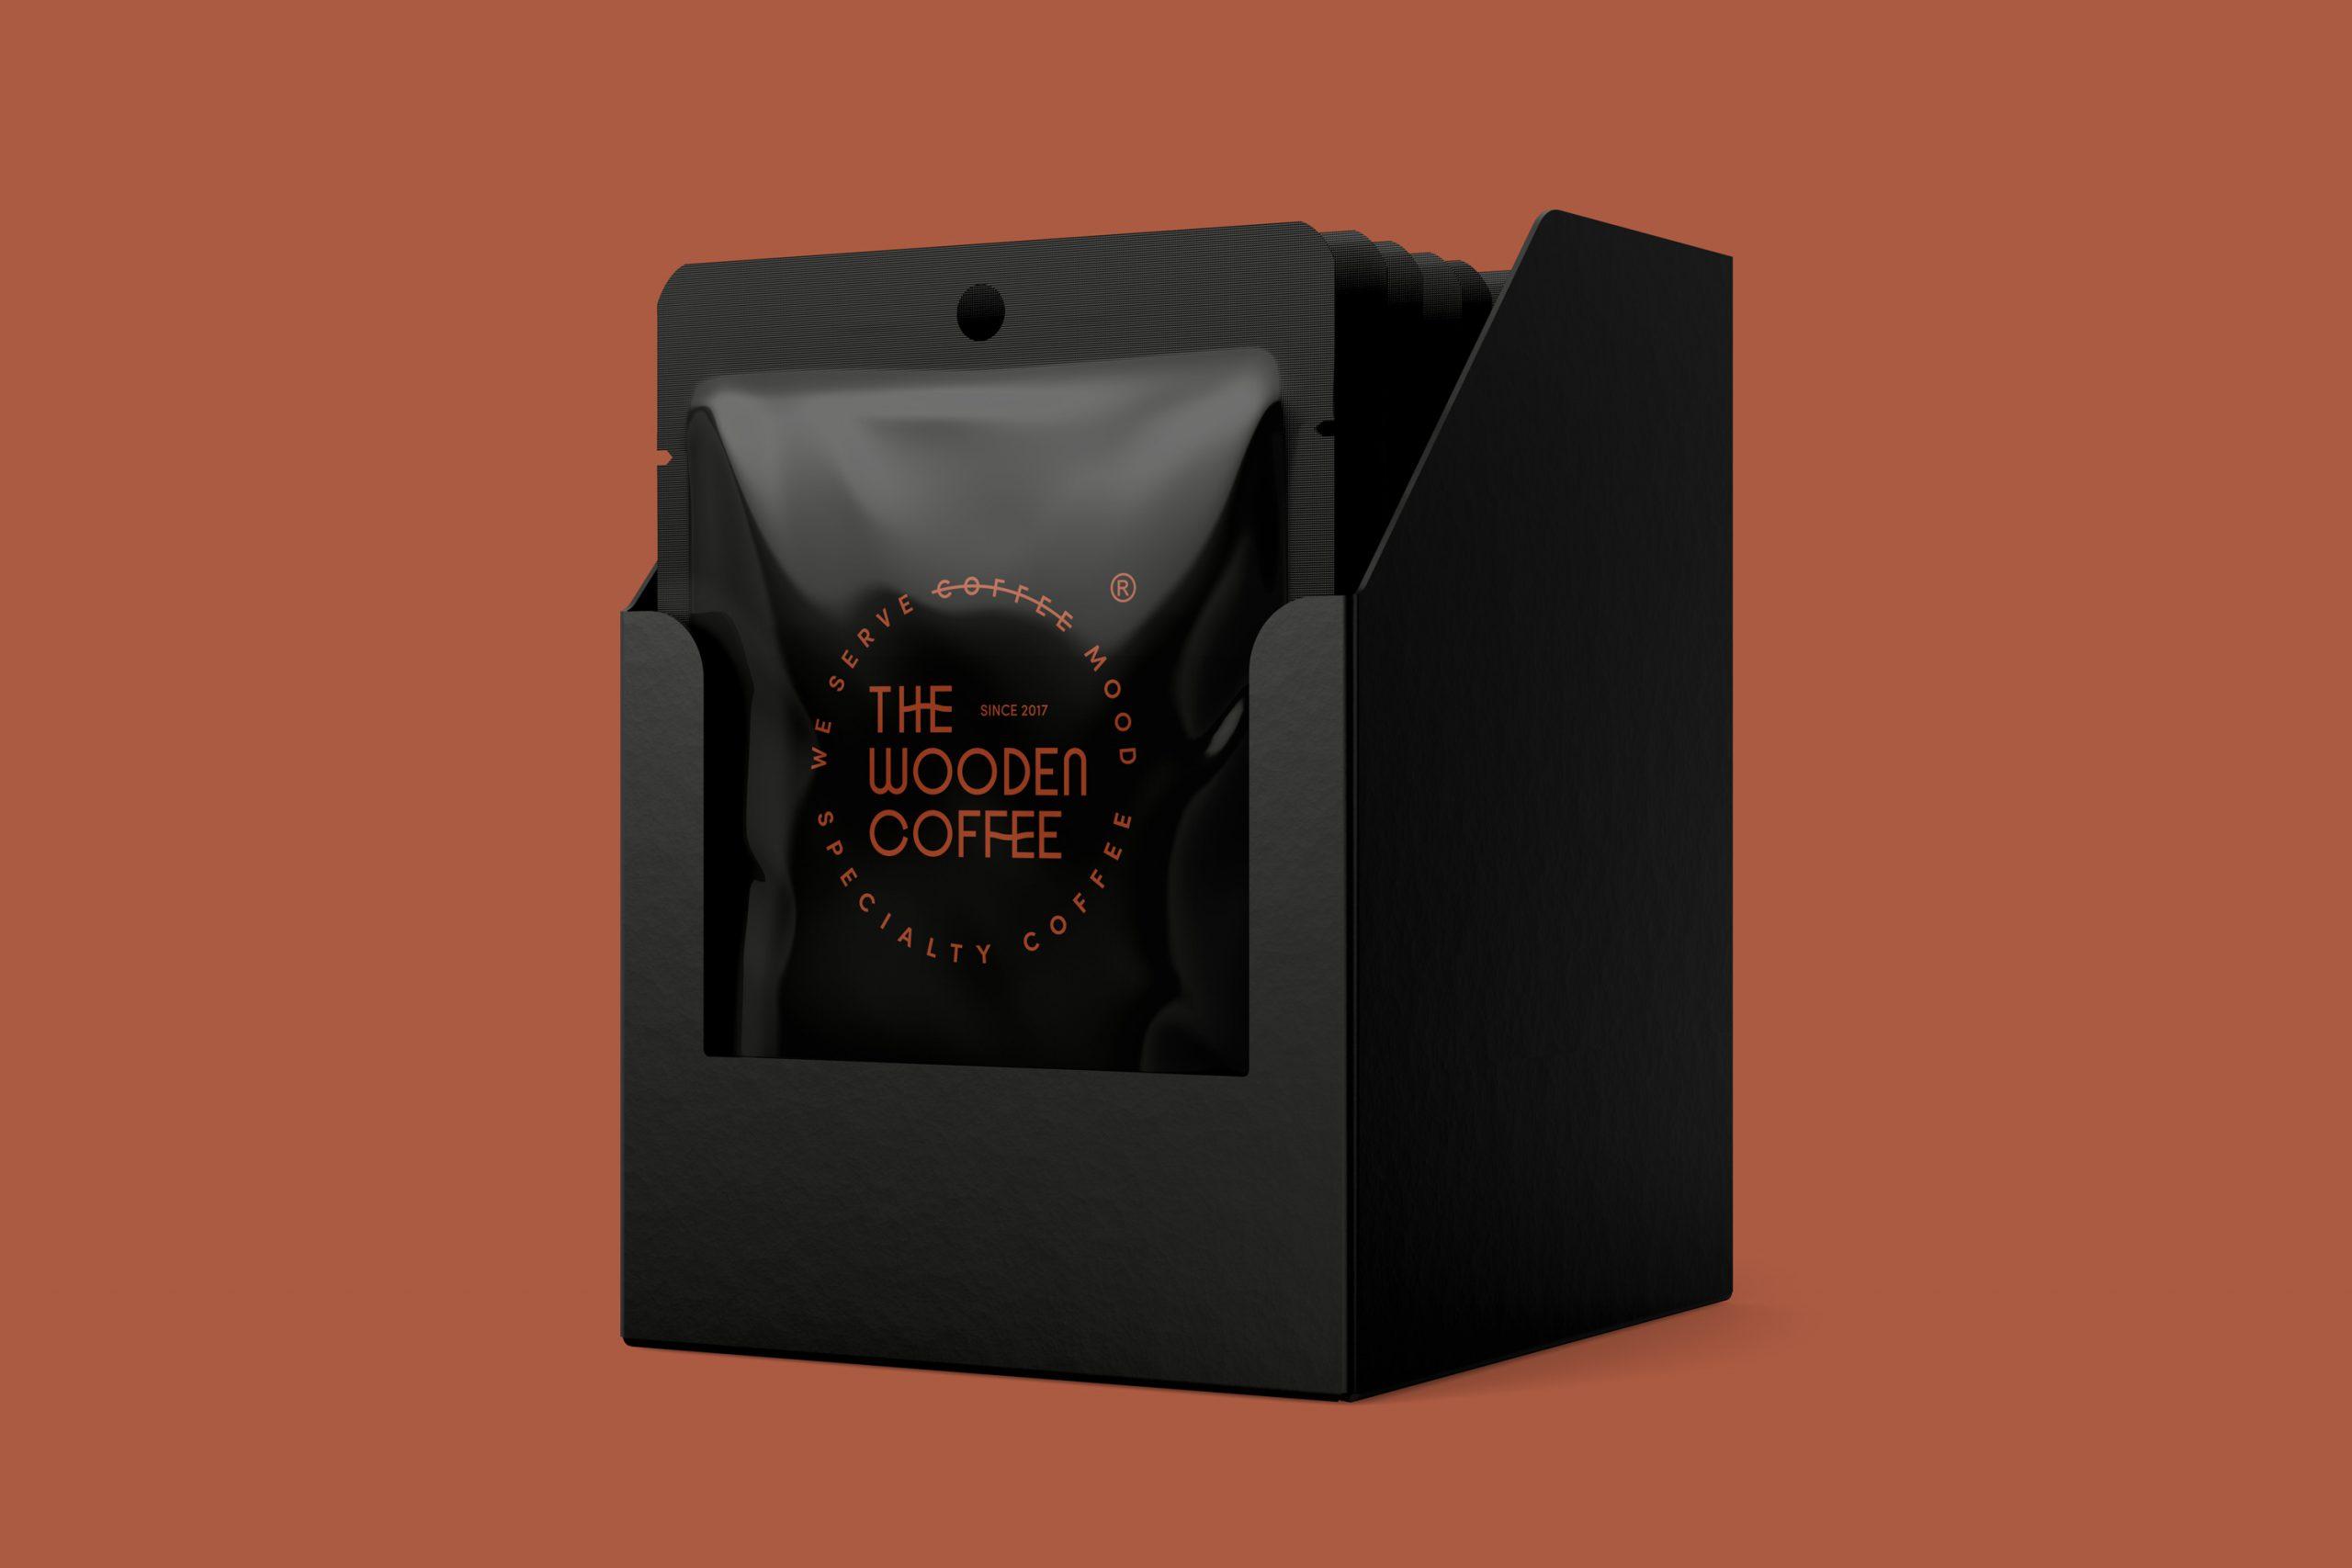 SmallCoffeePack-Wooden-Coffee-Work-by-YaStudio